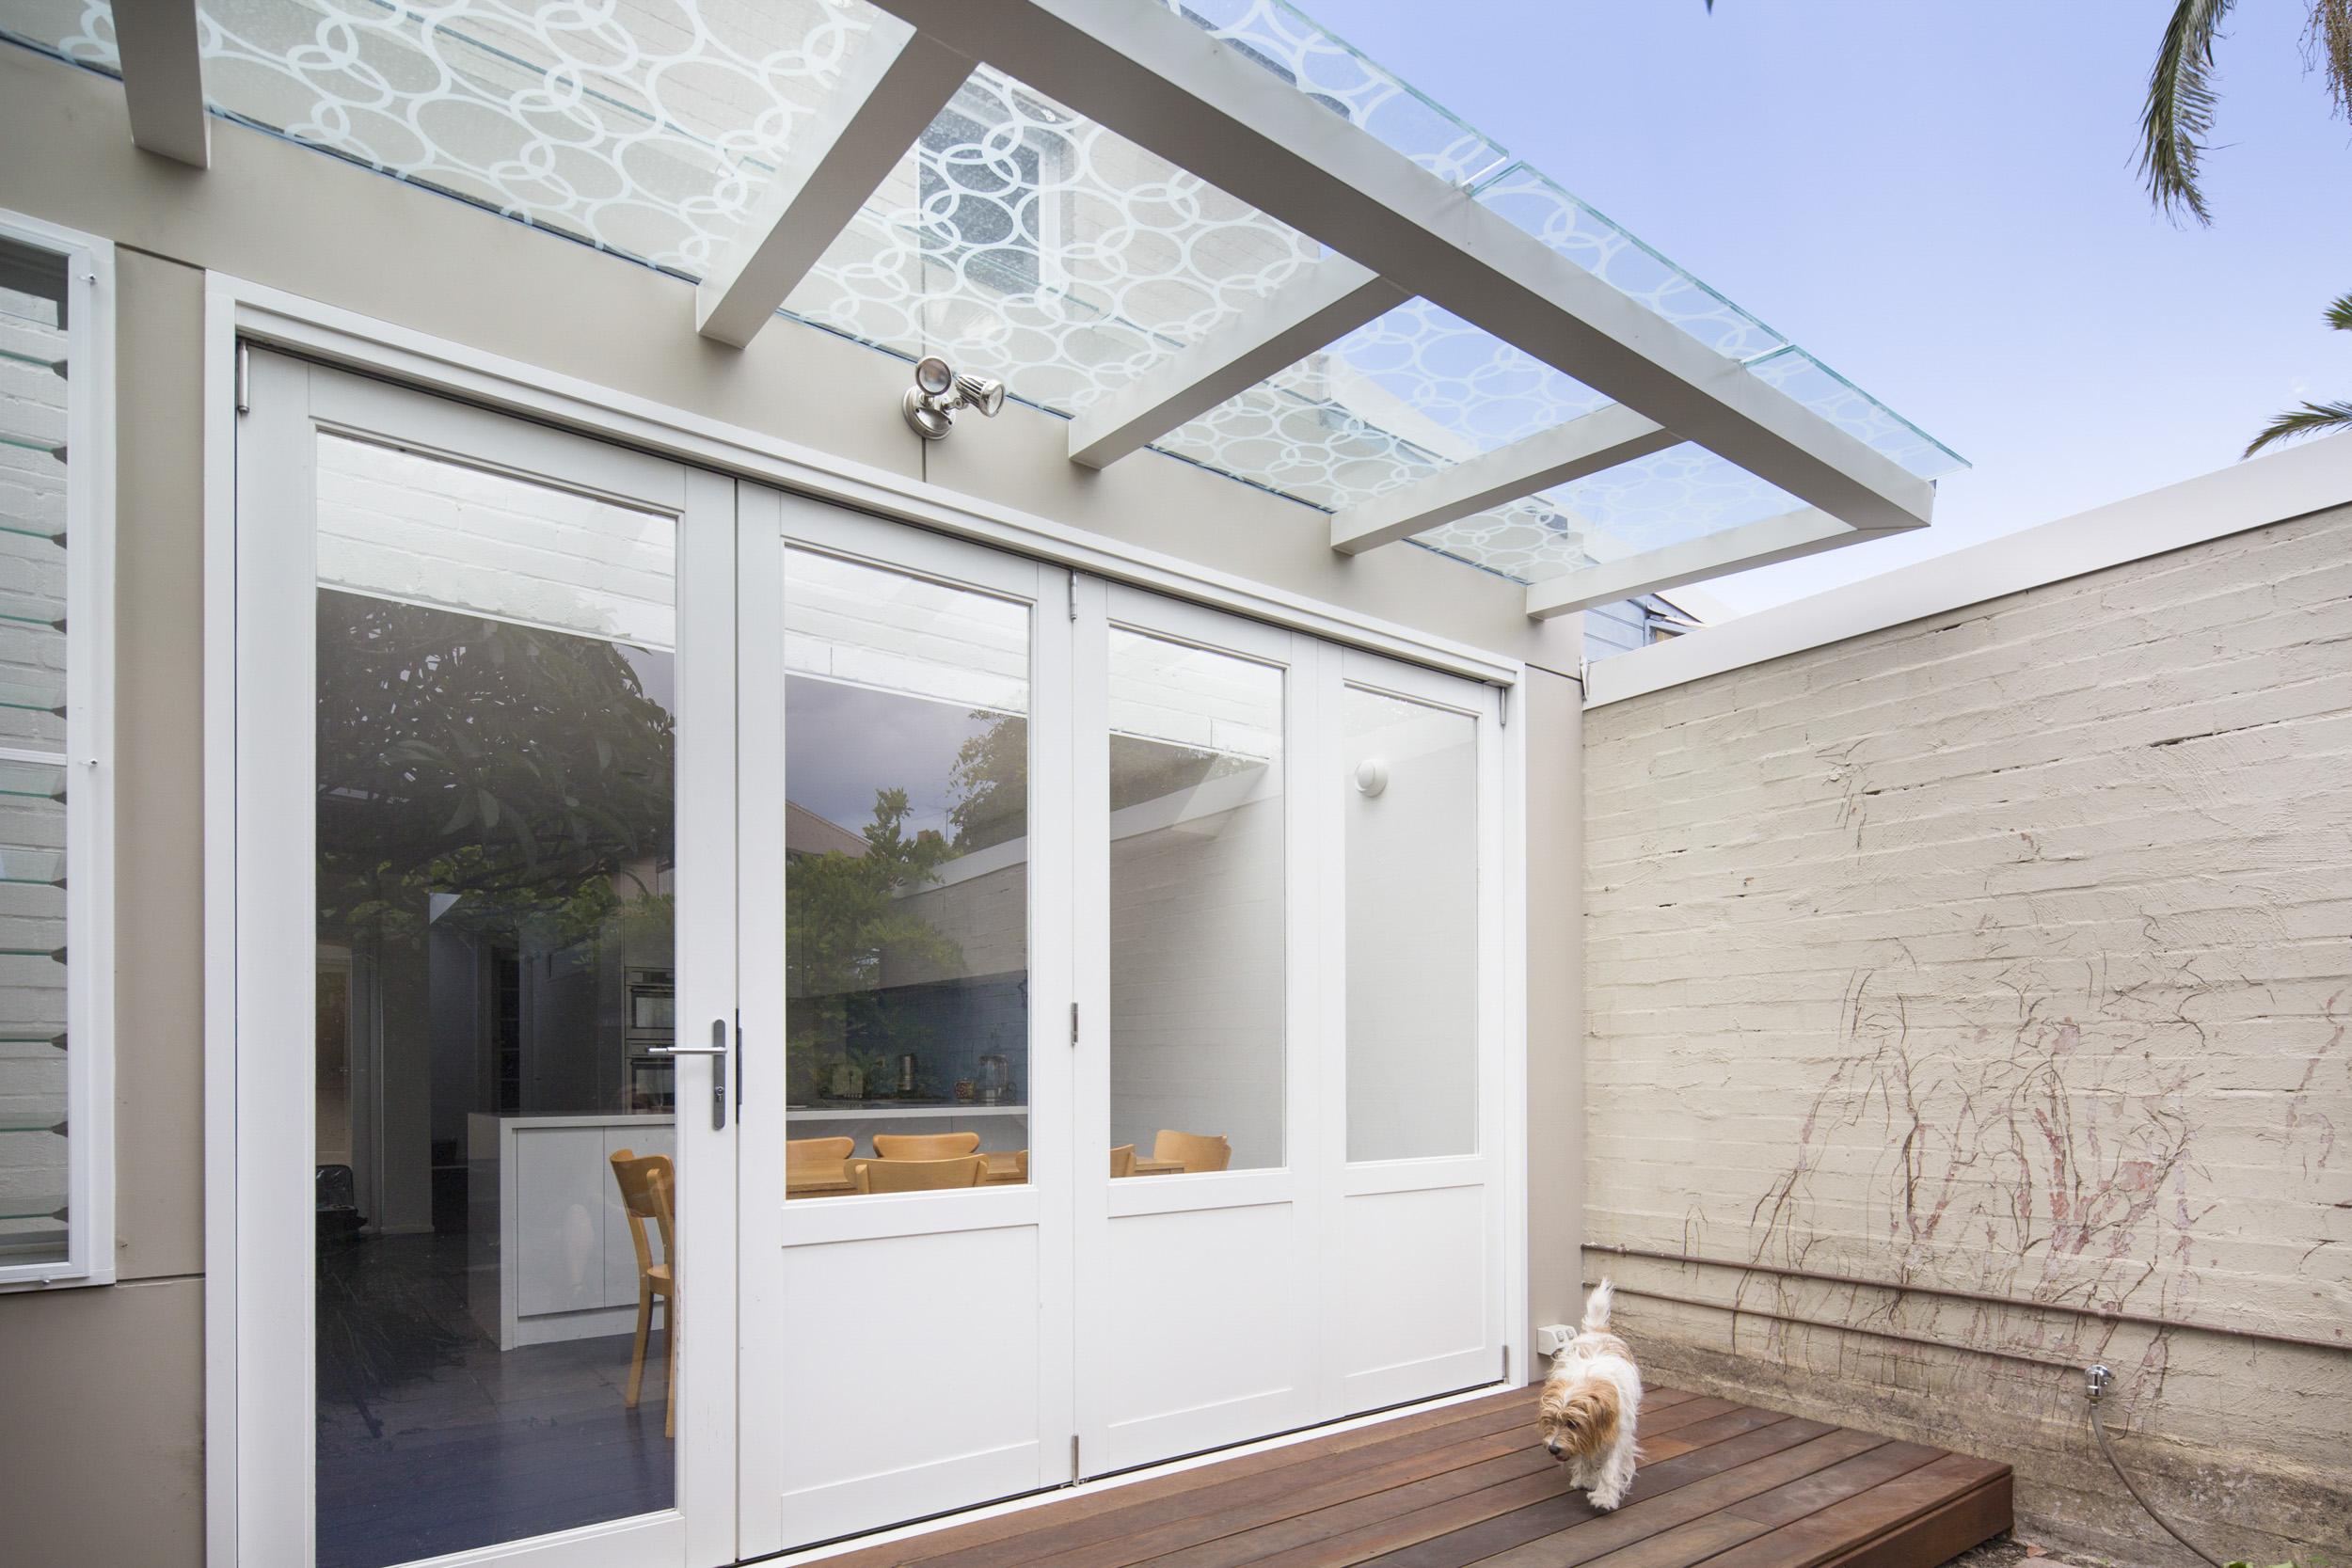 residential_architecture_sydney_australia_01.jpg